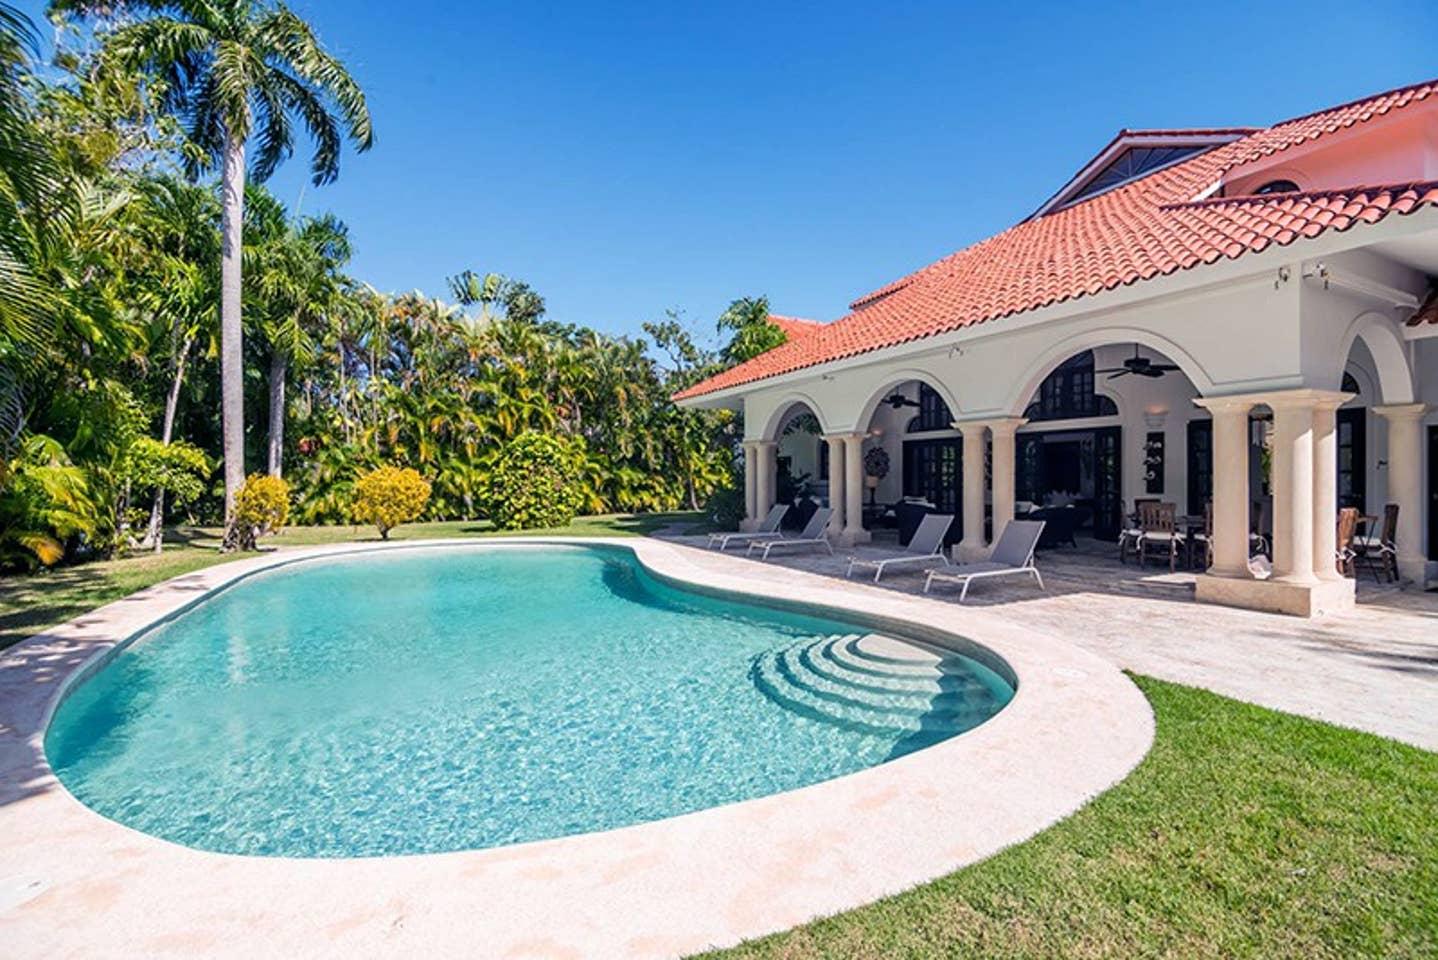 Apartment Luxury 4-Bedroom Estate Villa  Truly Beautiful  photo 25682456